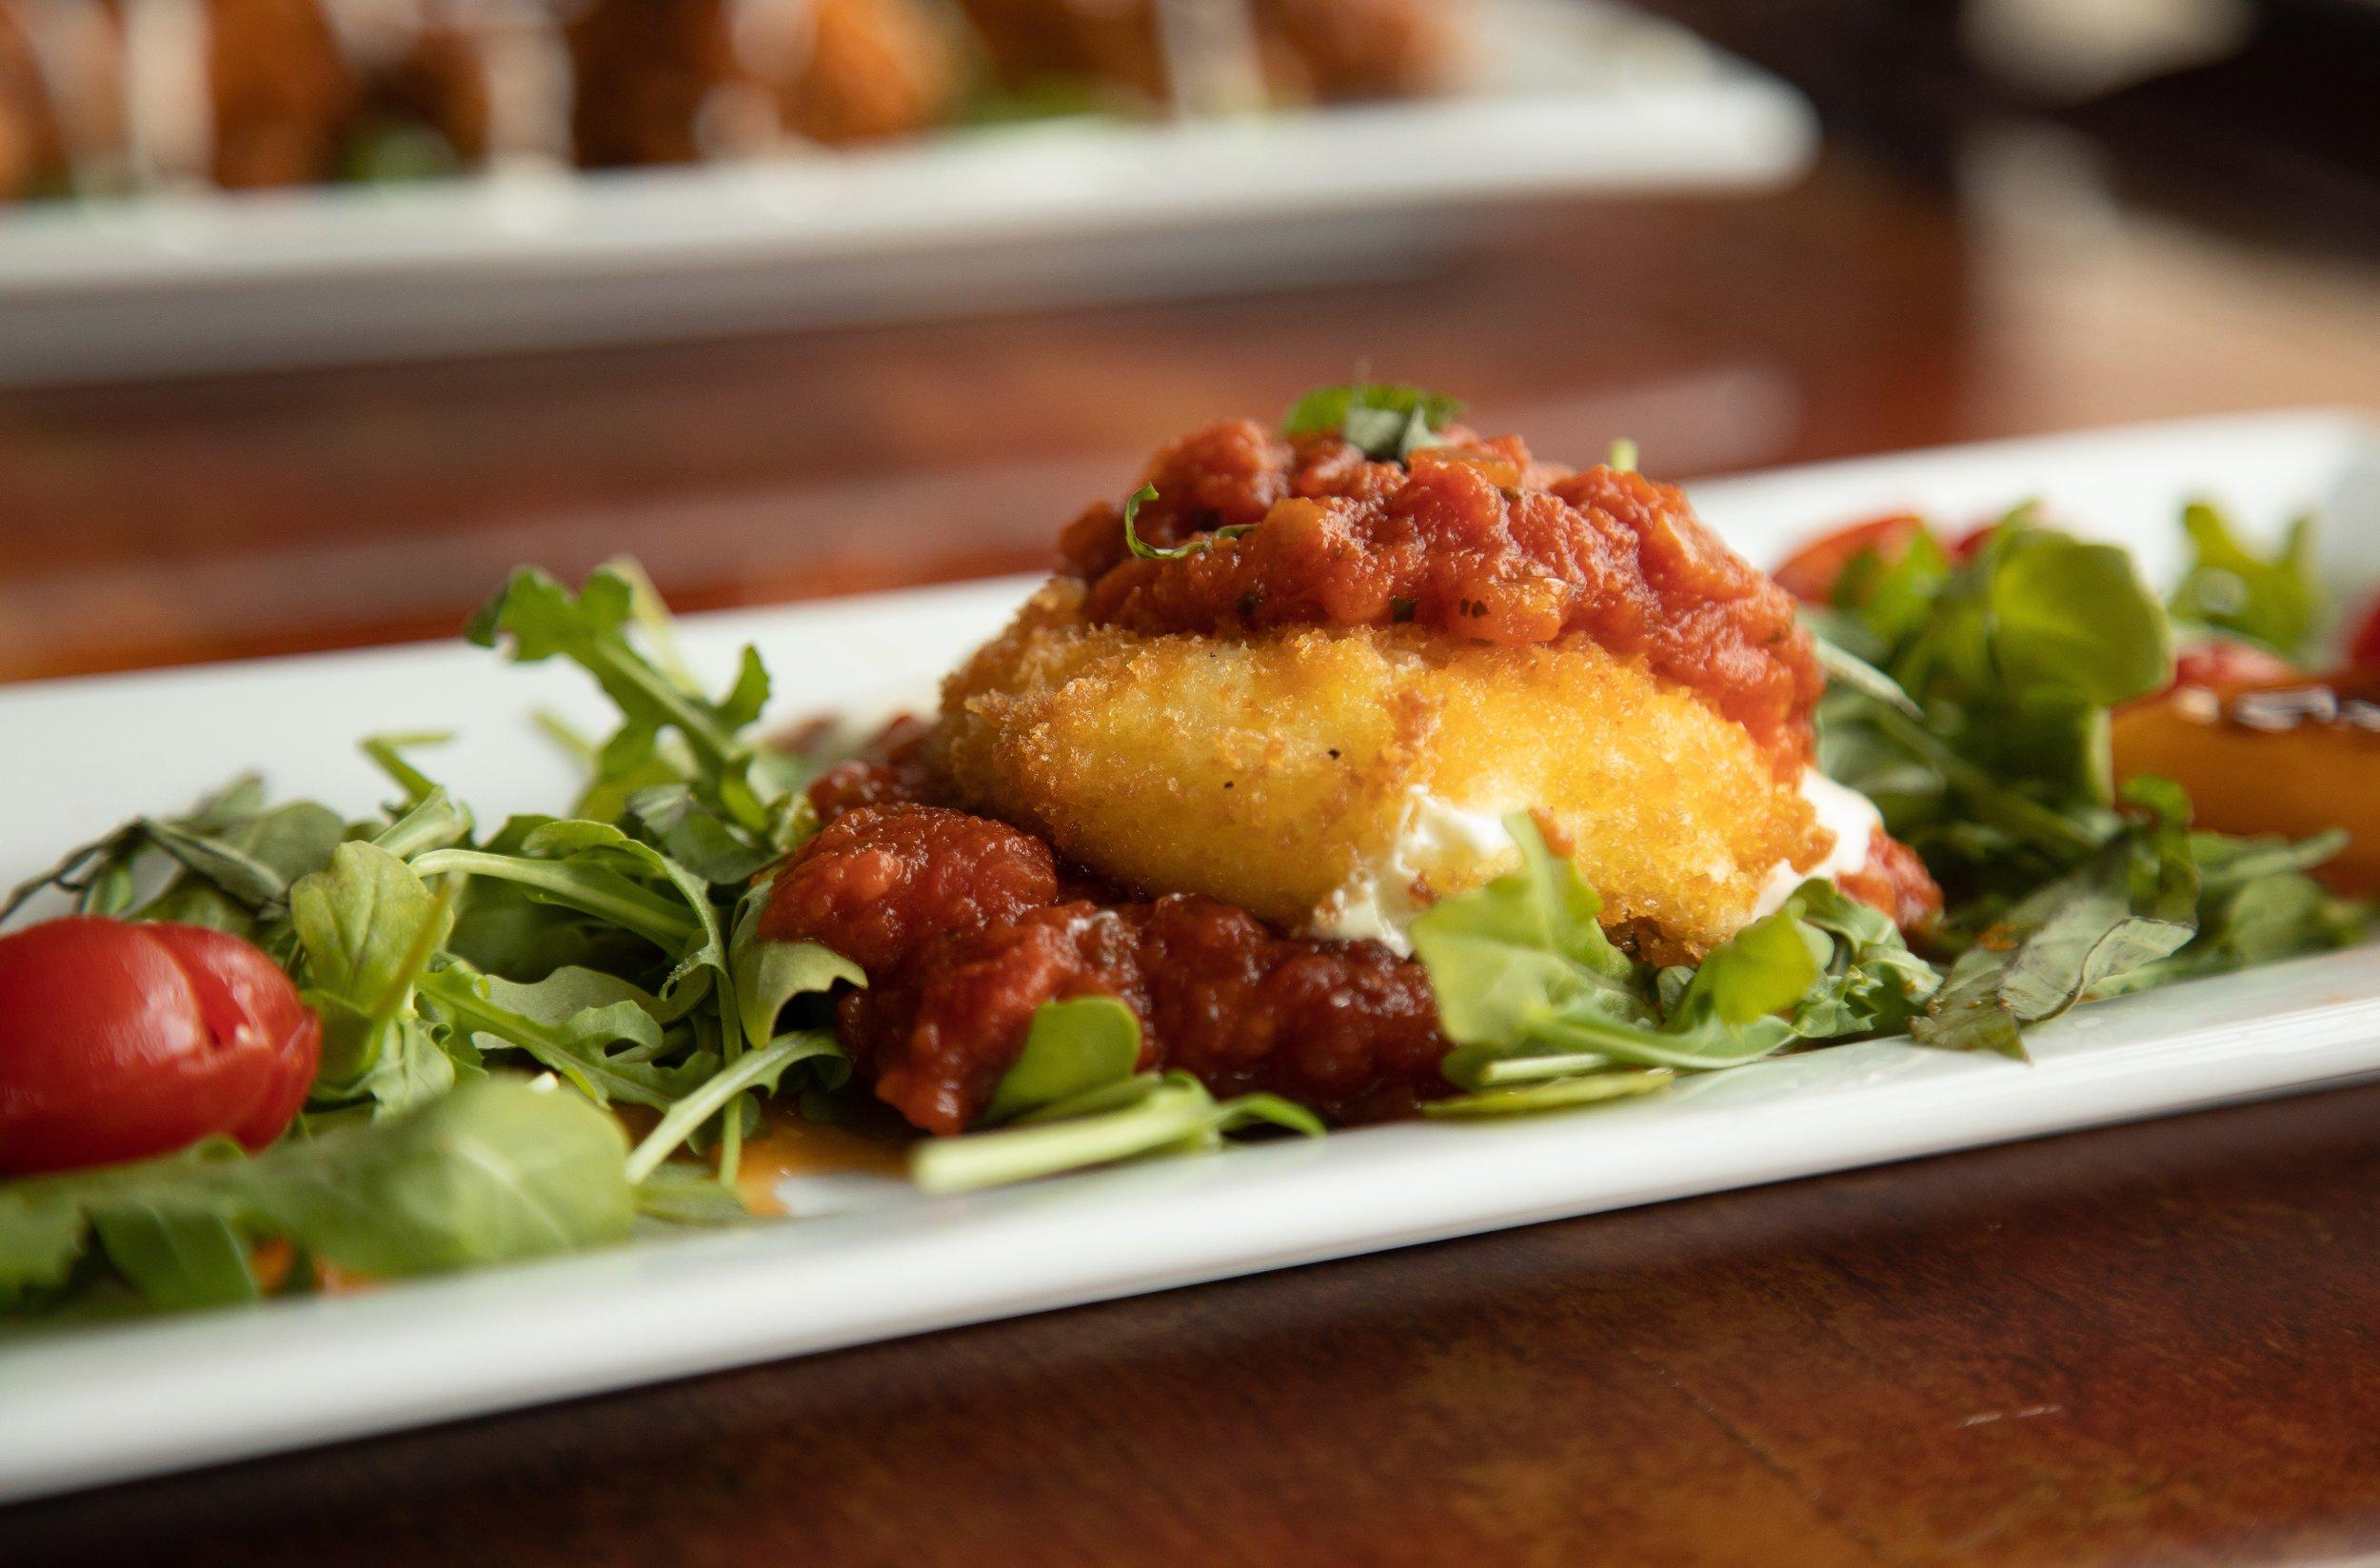 Signature Fried Burrata Salad - Delicately fried fresh mozzarella with a cream ricotta filling